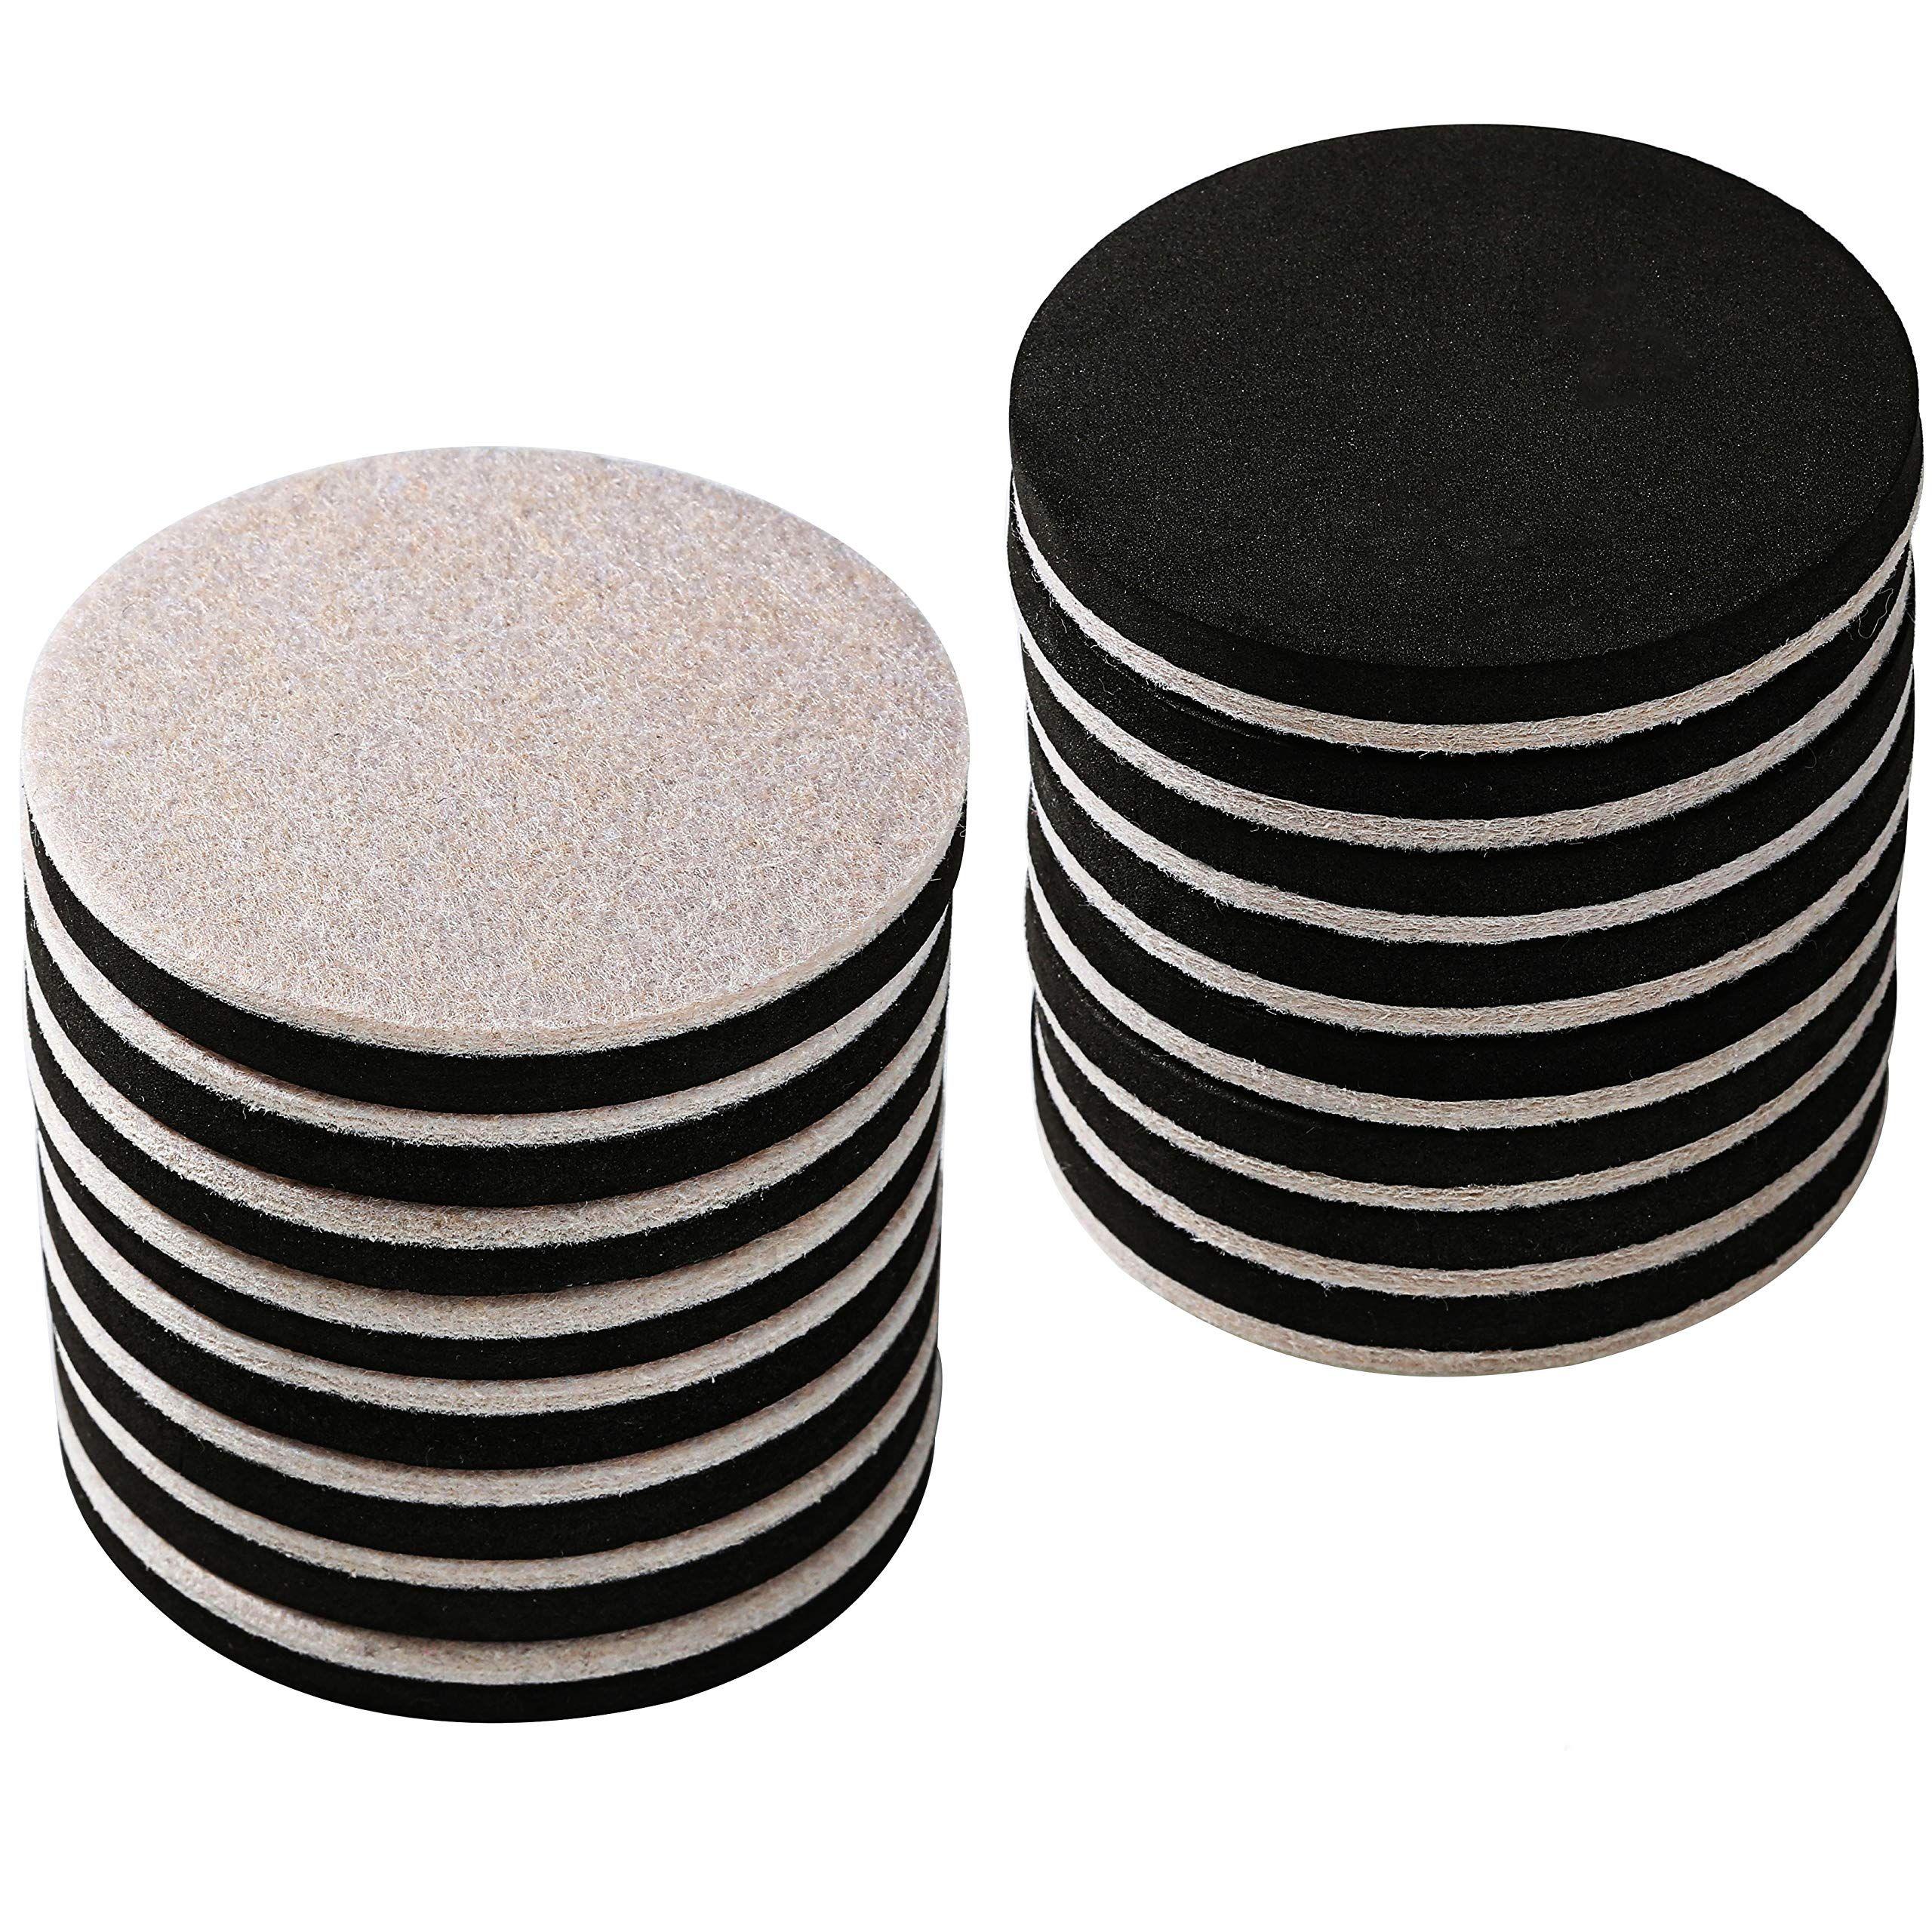 16 Pack 3 5 In Premium Heavy Furniture Movers For Wood Floor Felt